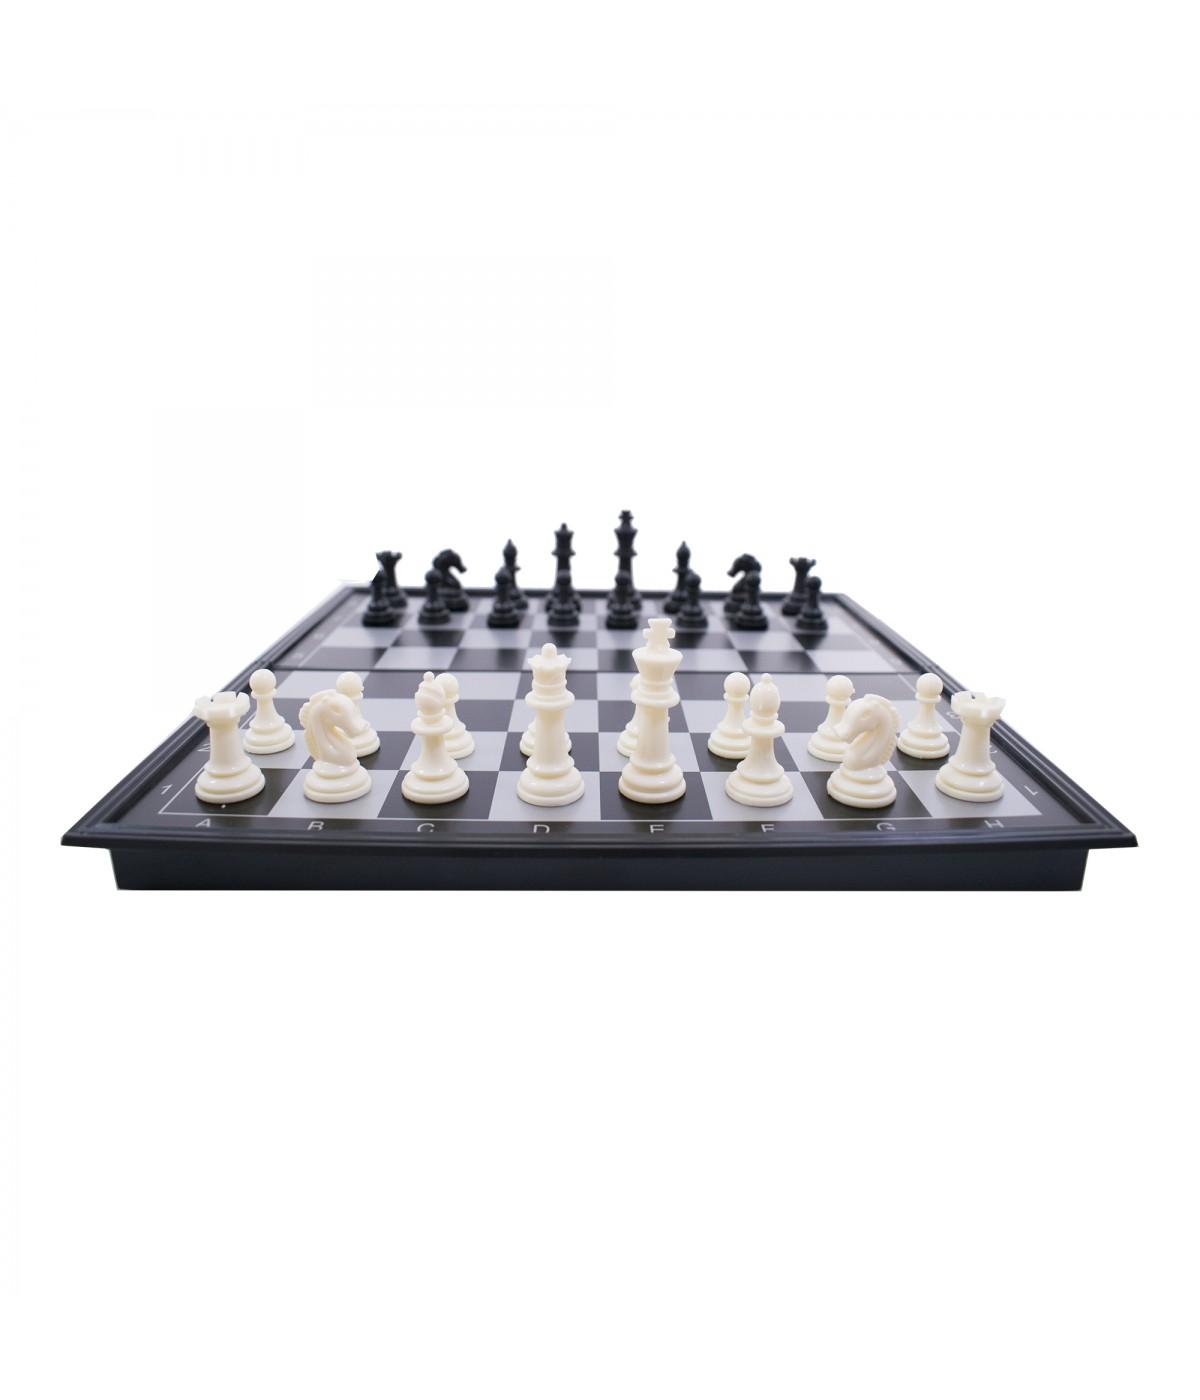 Jogo de Xadrez com tabuleiro dobrável a ímã 27X27CM